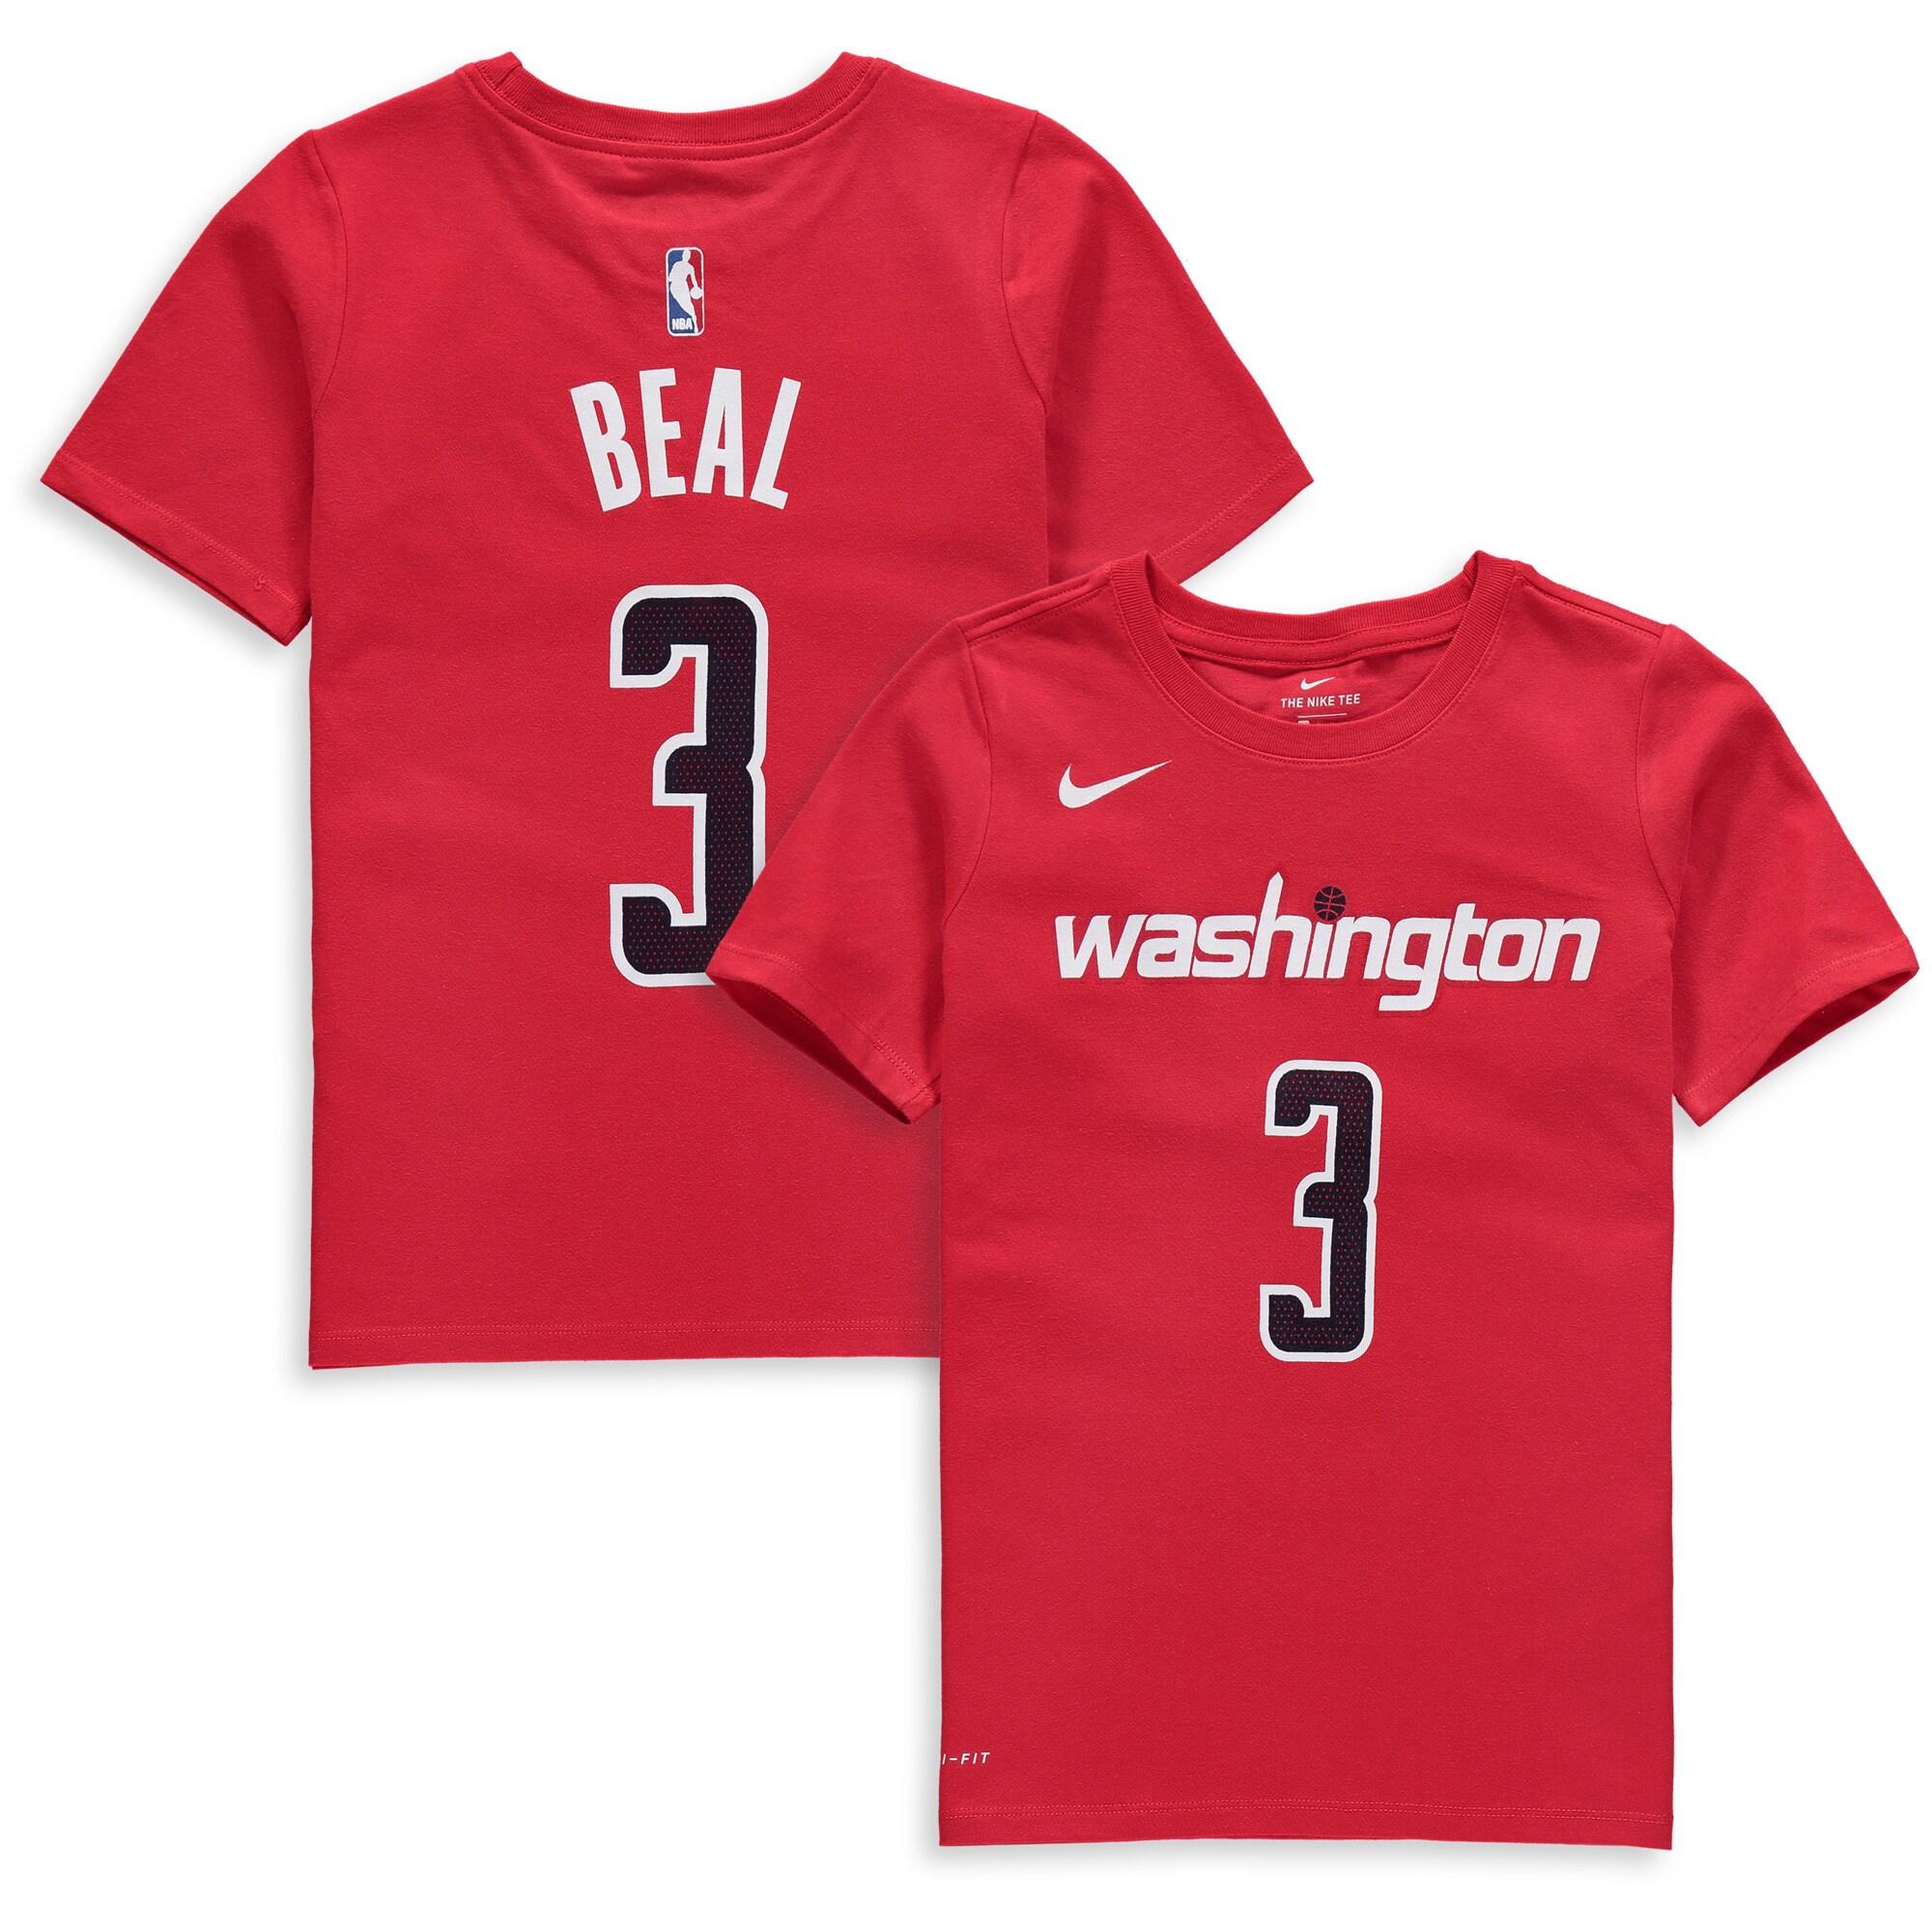 Bradley Beal Washington Wizards Nike Youth Name & Number Performance T-Shirt - Red